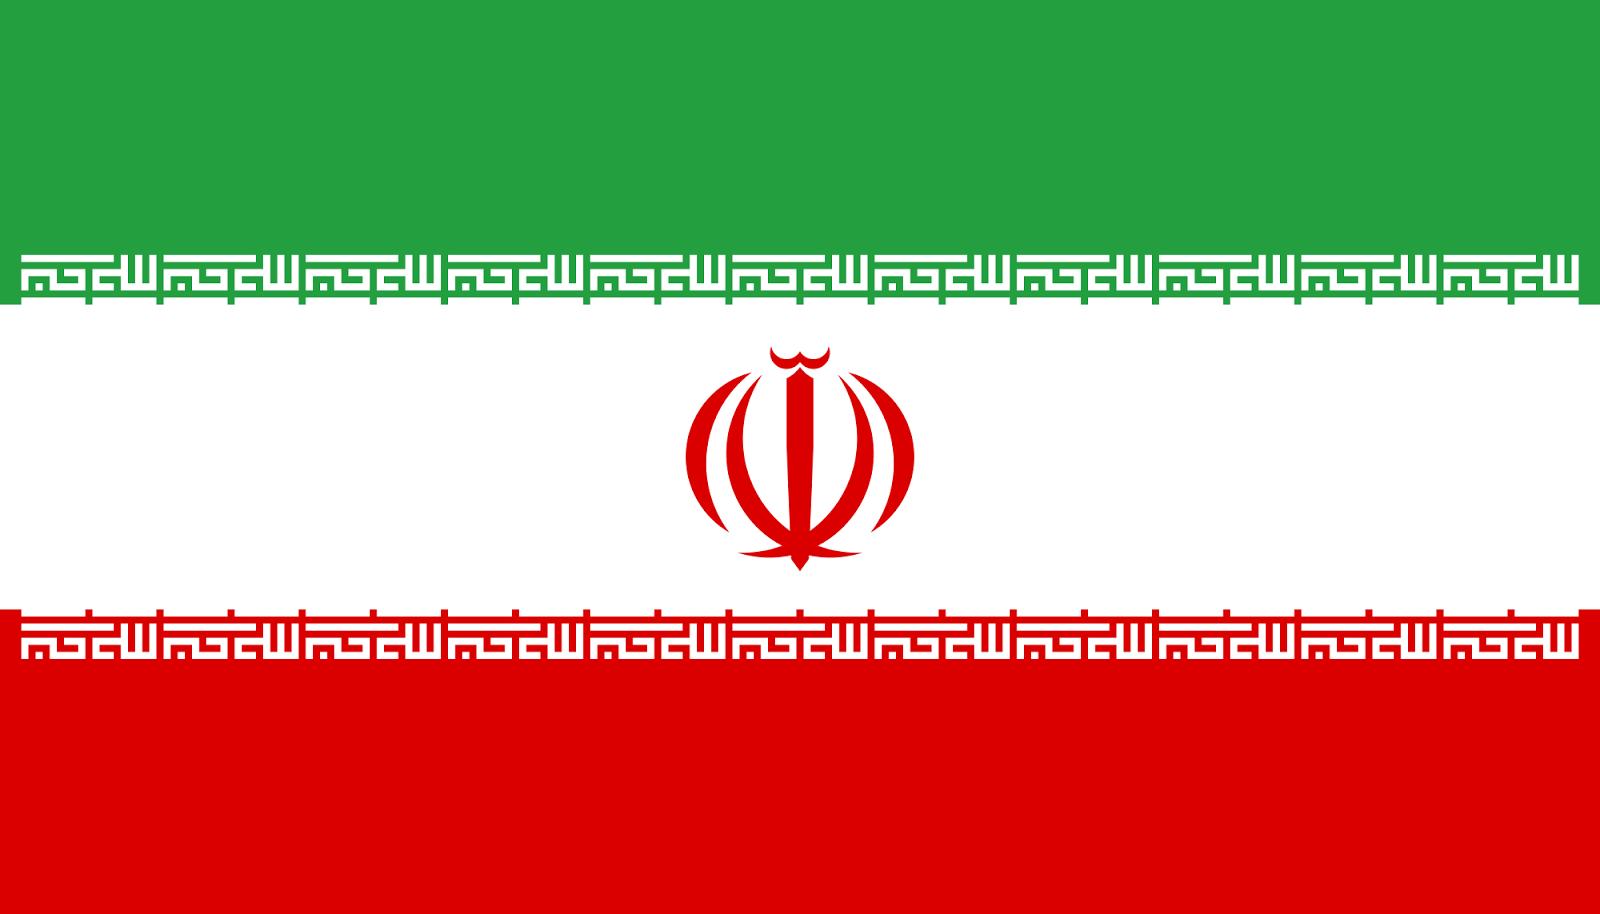 http://carbrandsincurrentproduction.blogspot.com.es/search/label/Iran